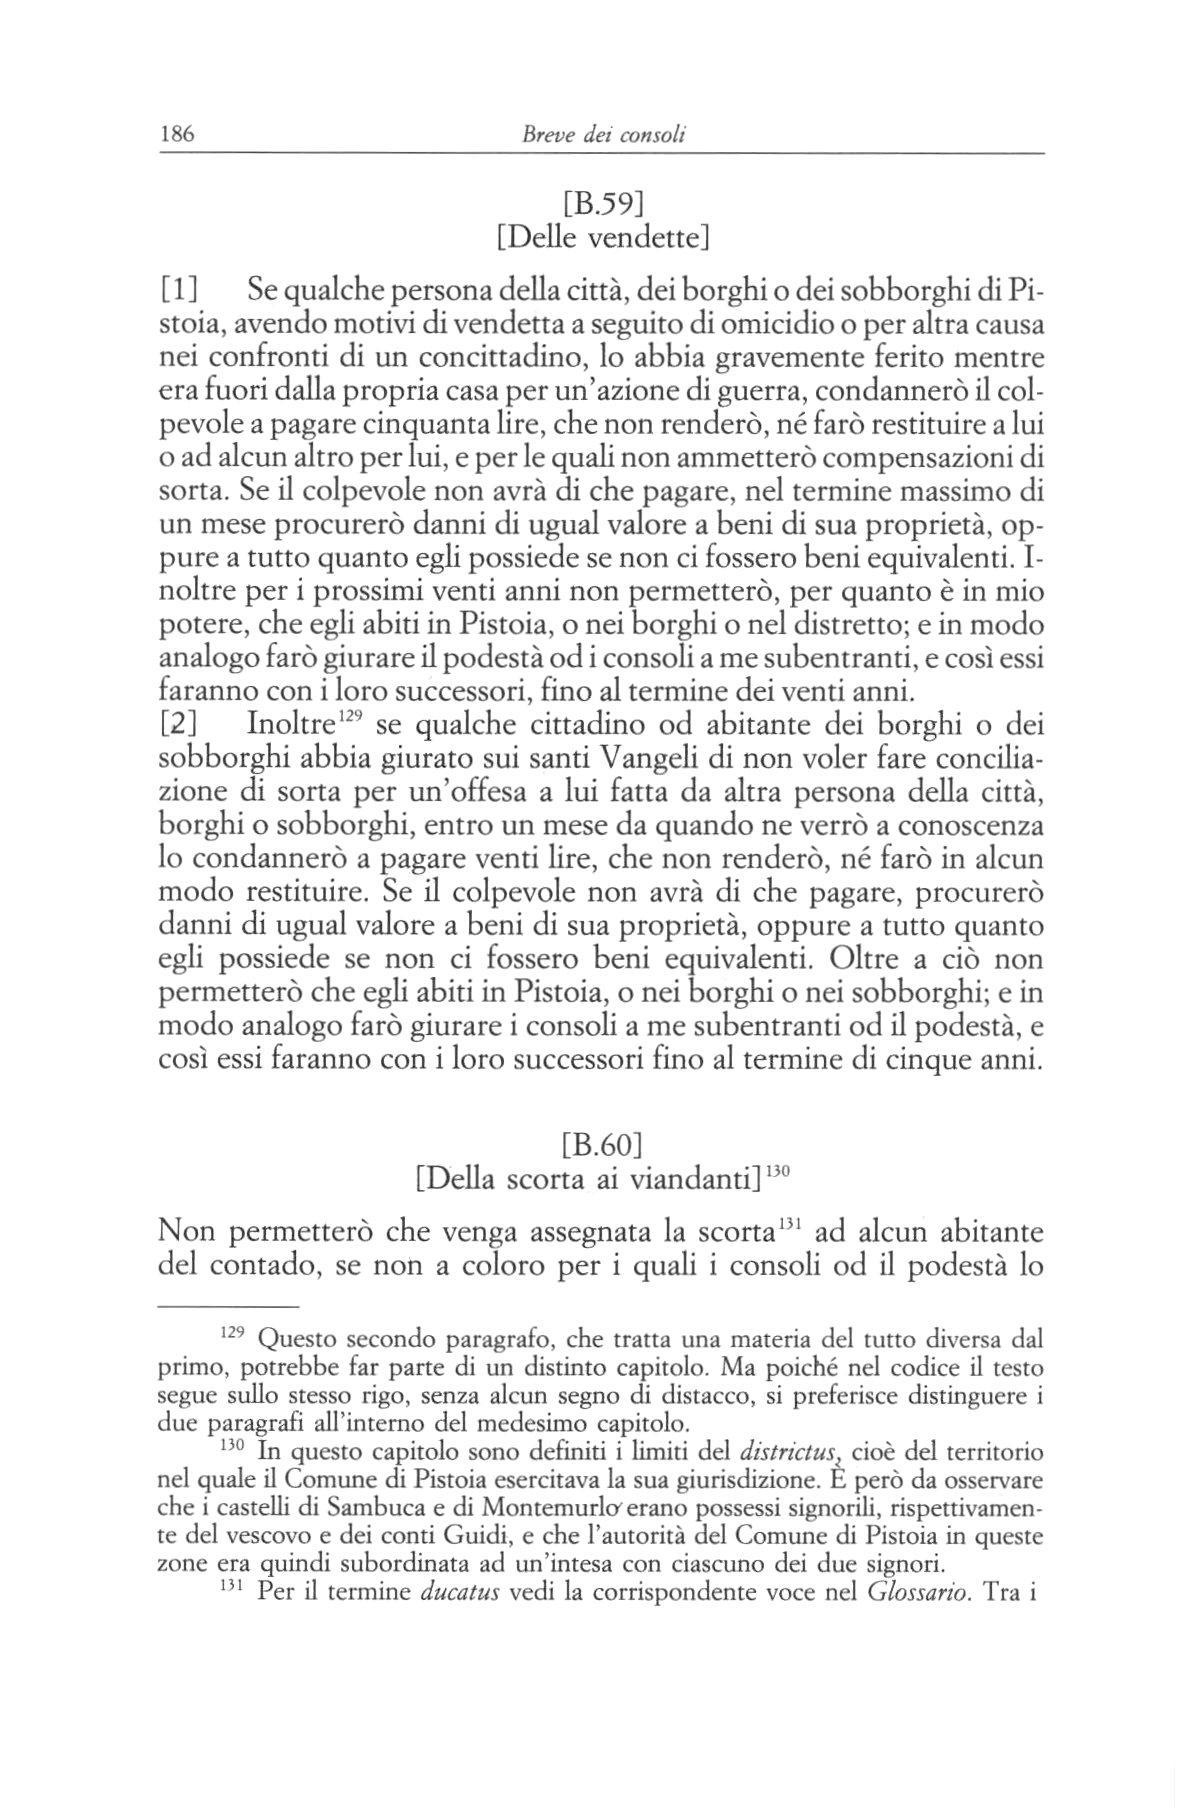 statuti pistoiesi del sec.XII 0186.jpg